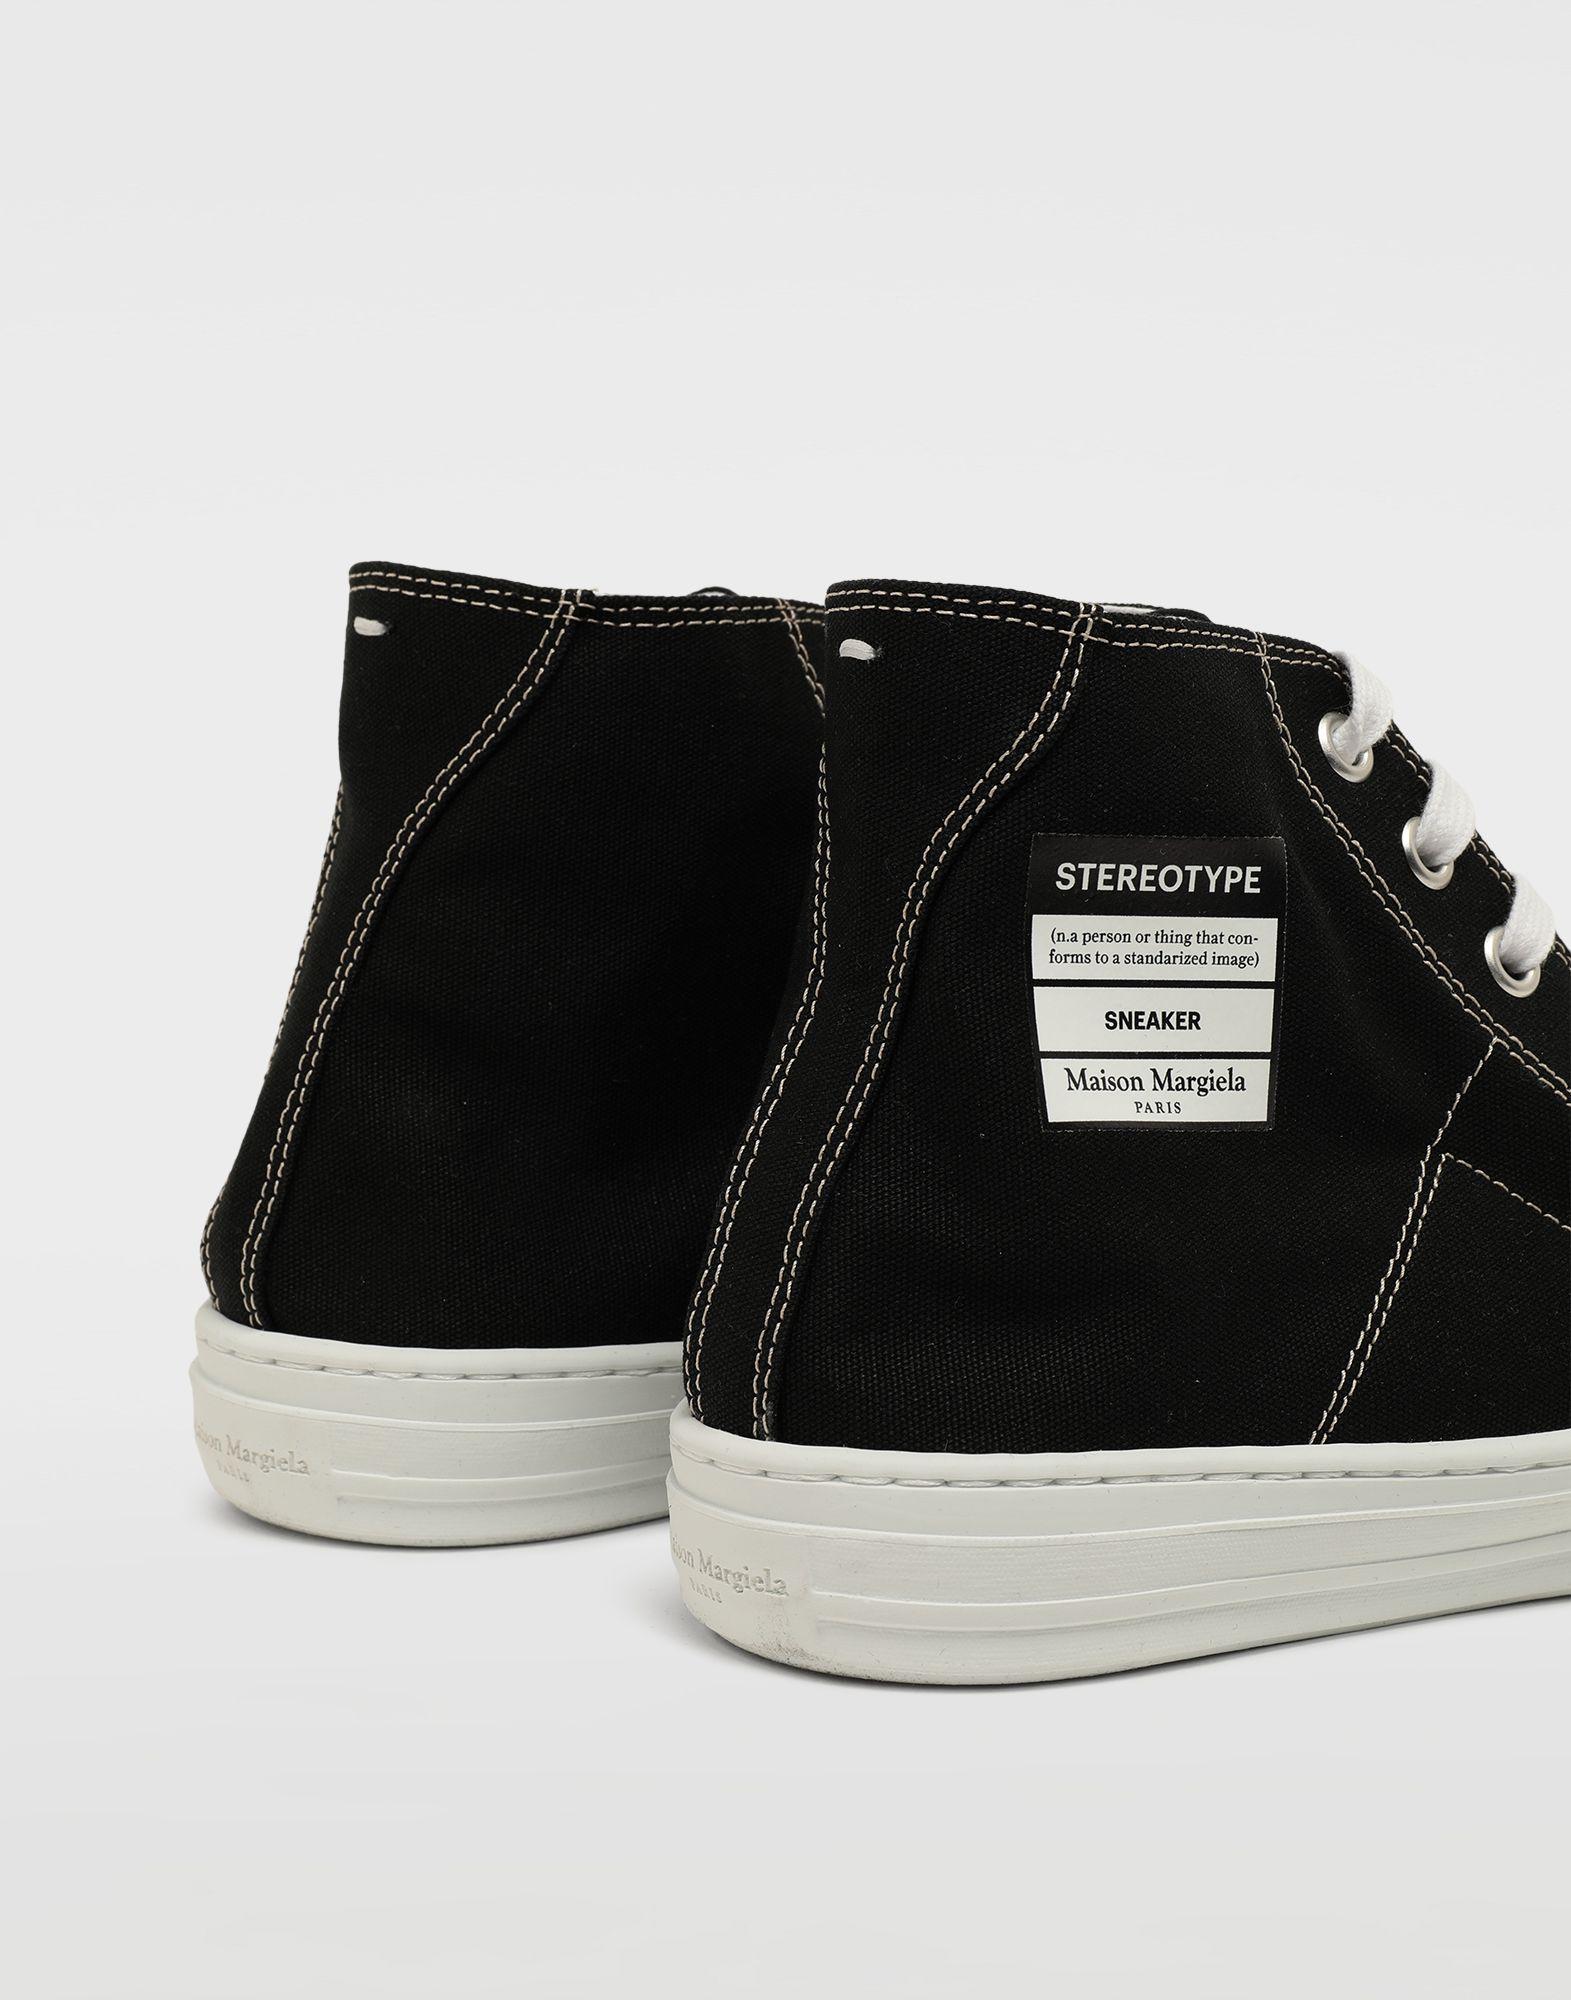 MAISON MARGIELA High-Top-Sneakers Stereotype Sneakers Herren a